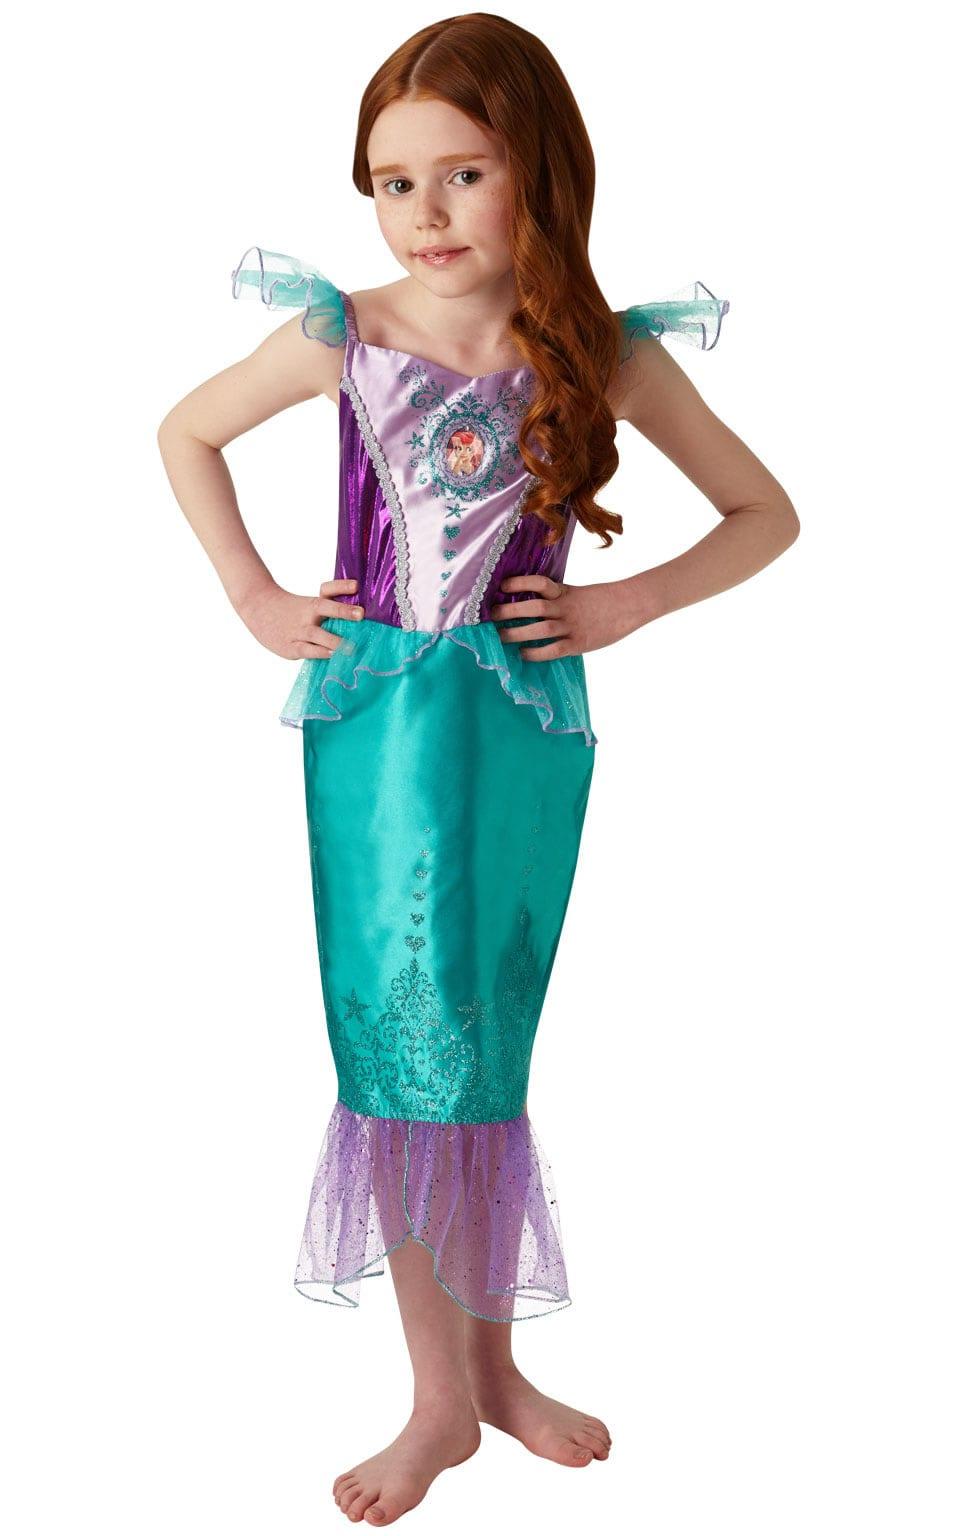 Disney Princess Gem Princess Ariel Children's Fancy Dress Costume